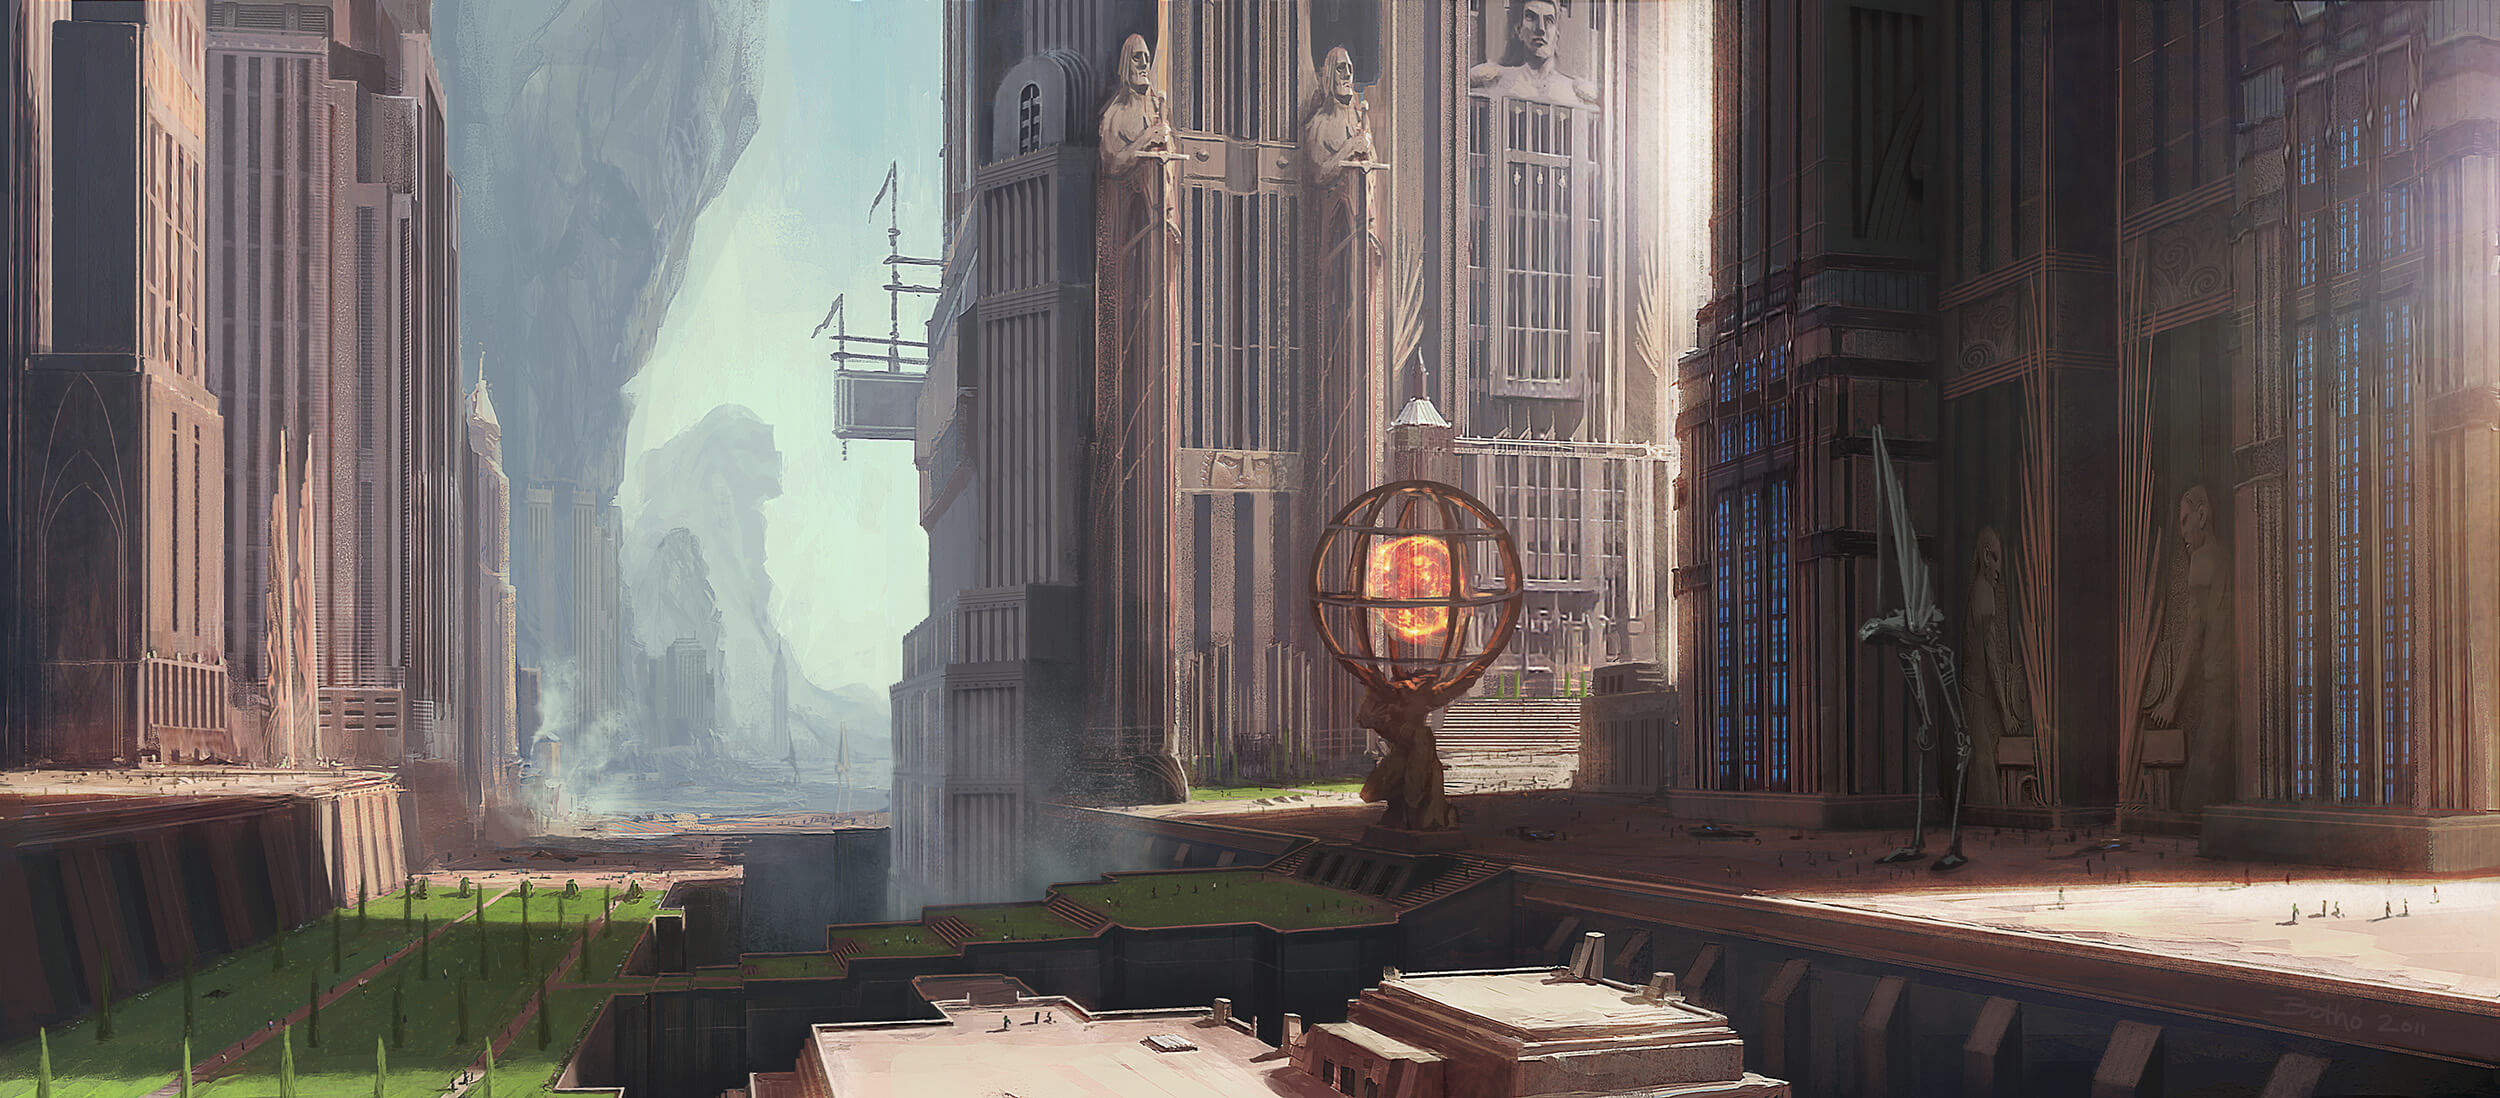 felix-haas-environment-concept-art-artdeco_grandiosity006